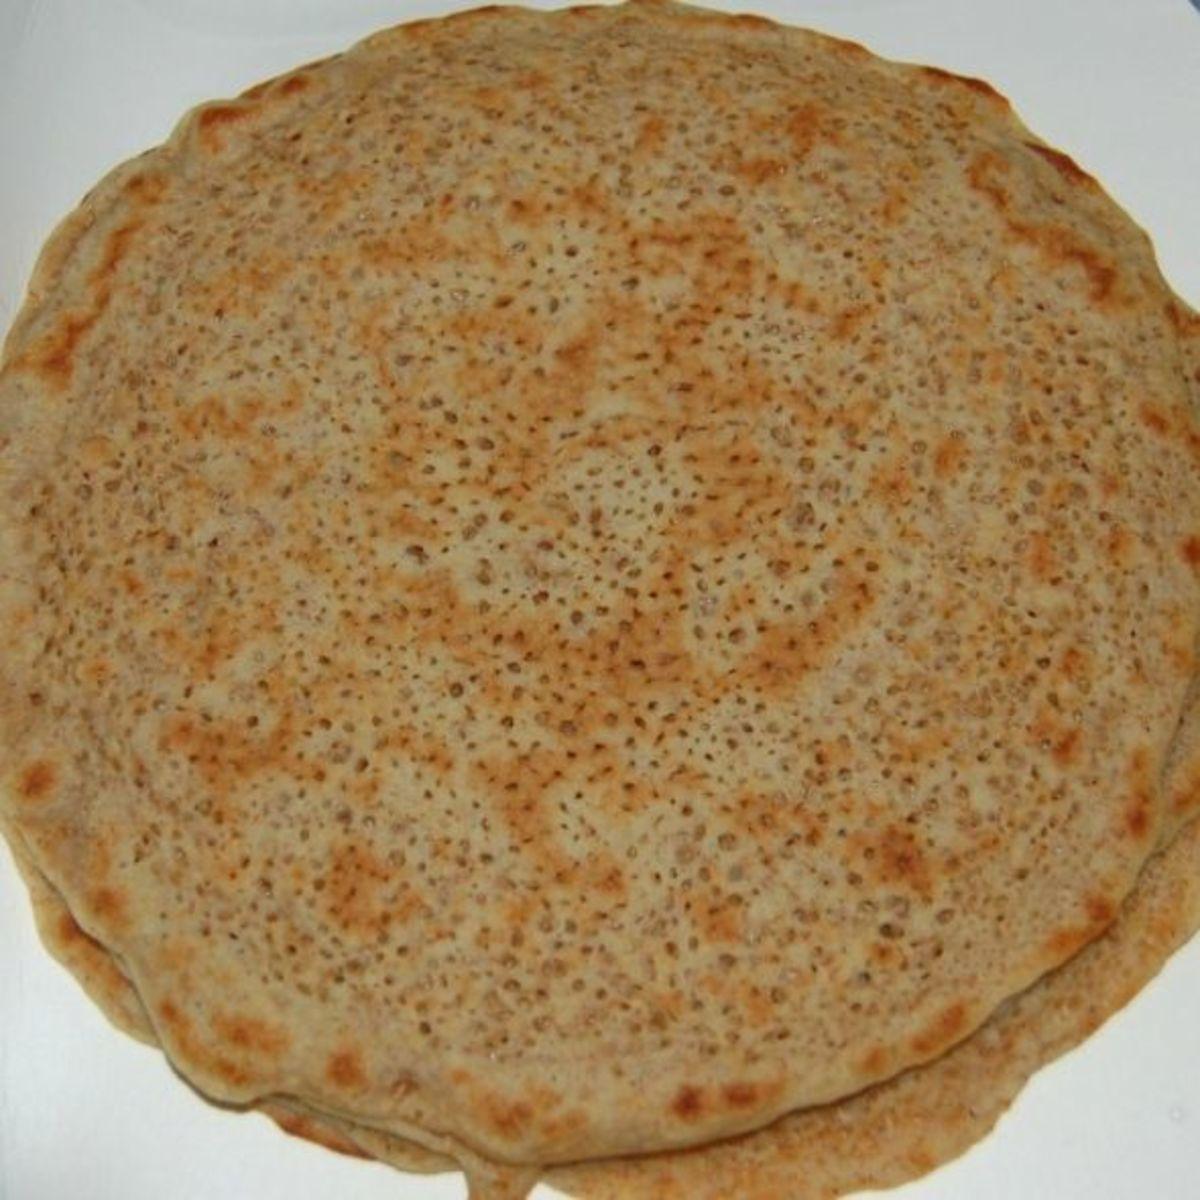 staffordshire-oatcake